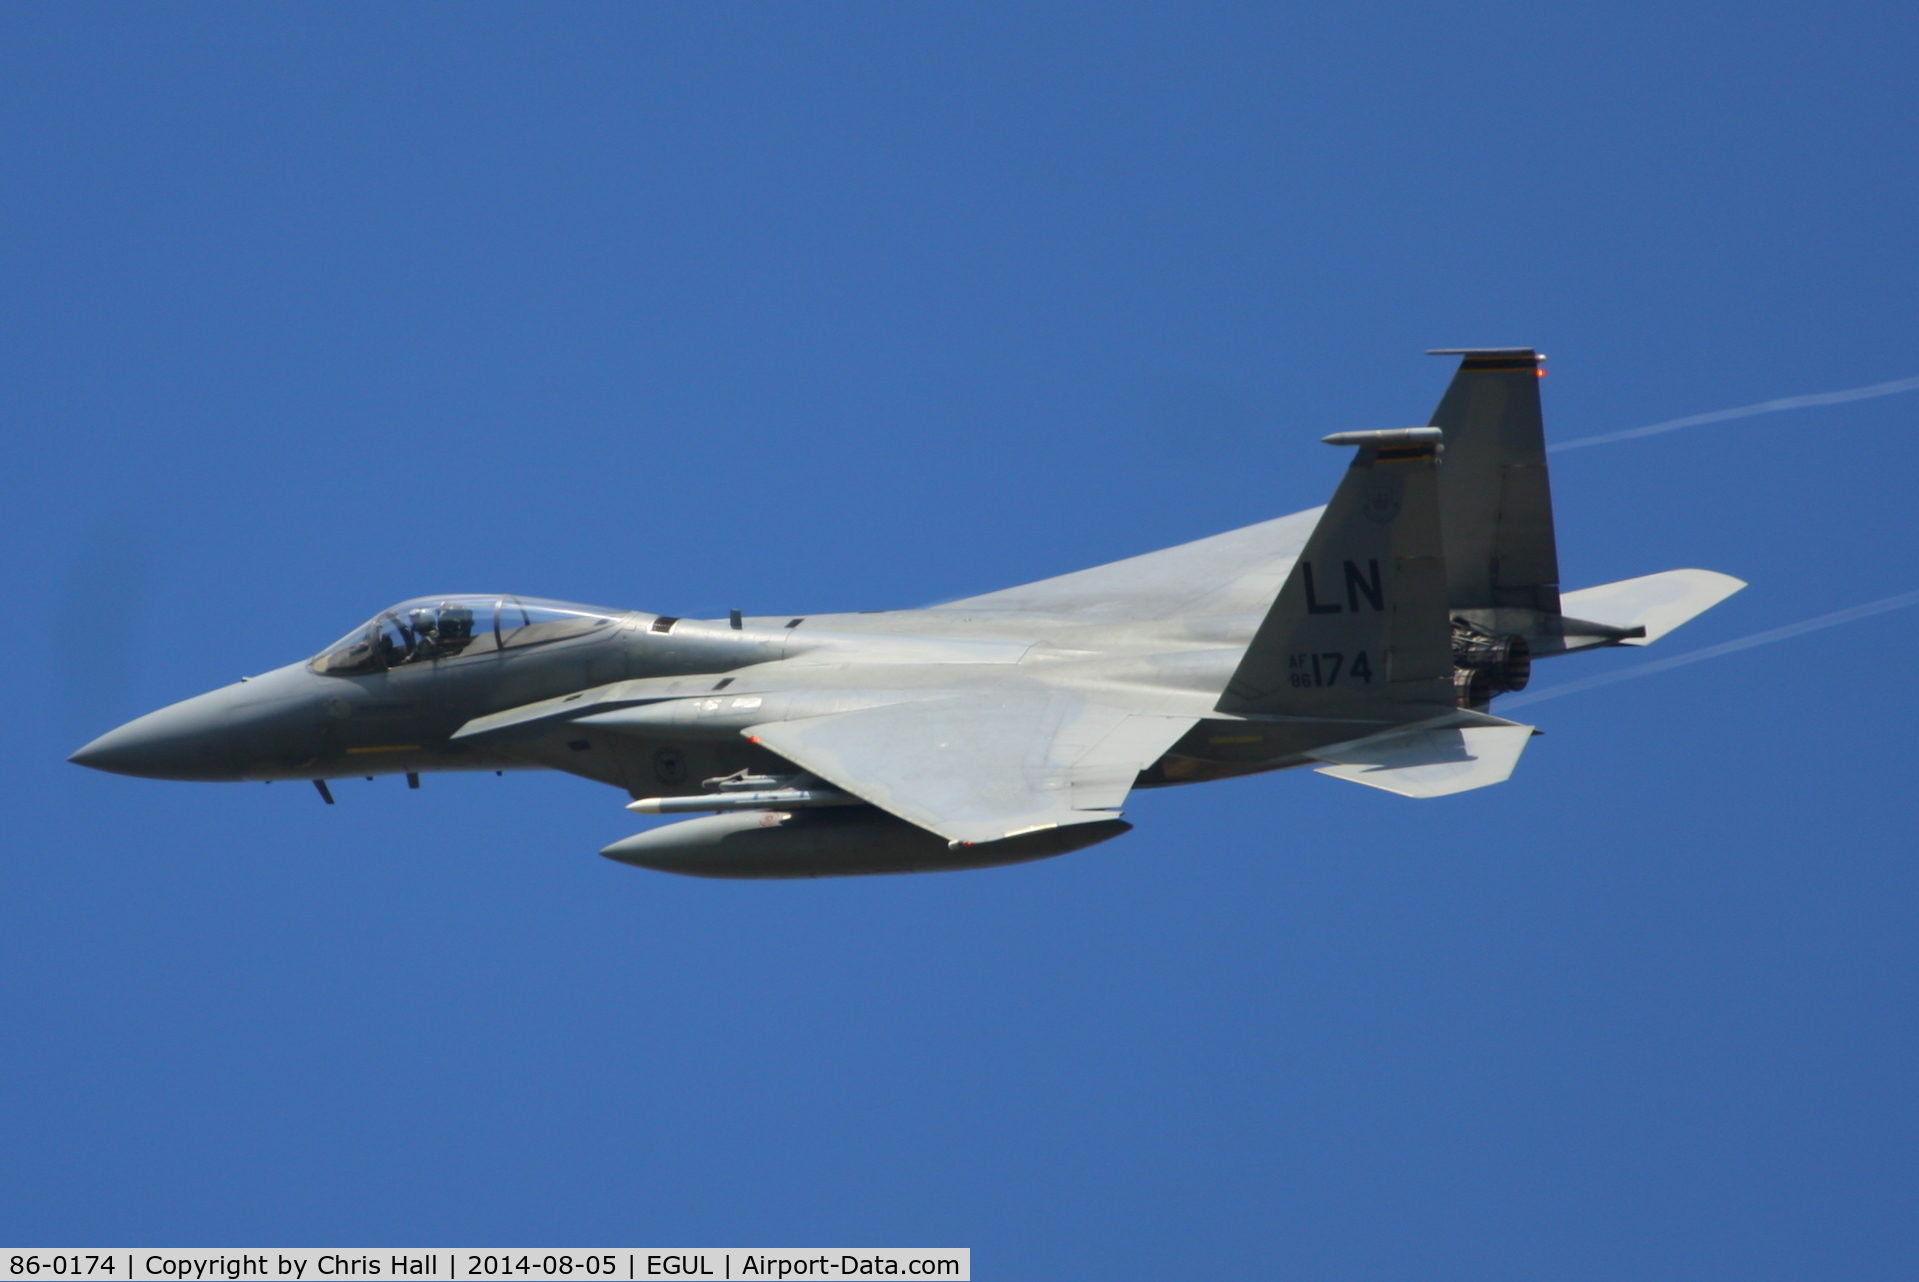 86-0174, 1986 McDonnell Douglas F-15C Eagle C/N 1024/C402, 493rd Fighter Squadron, 'Grim Reapers'